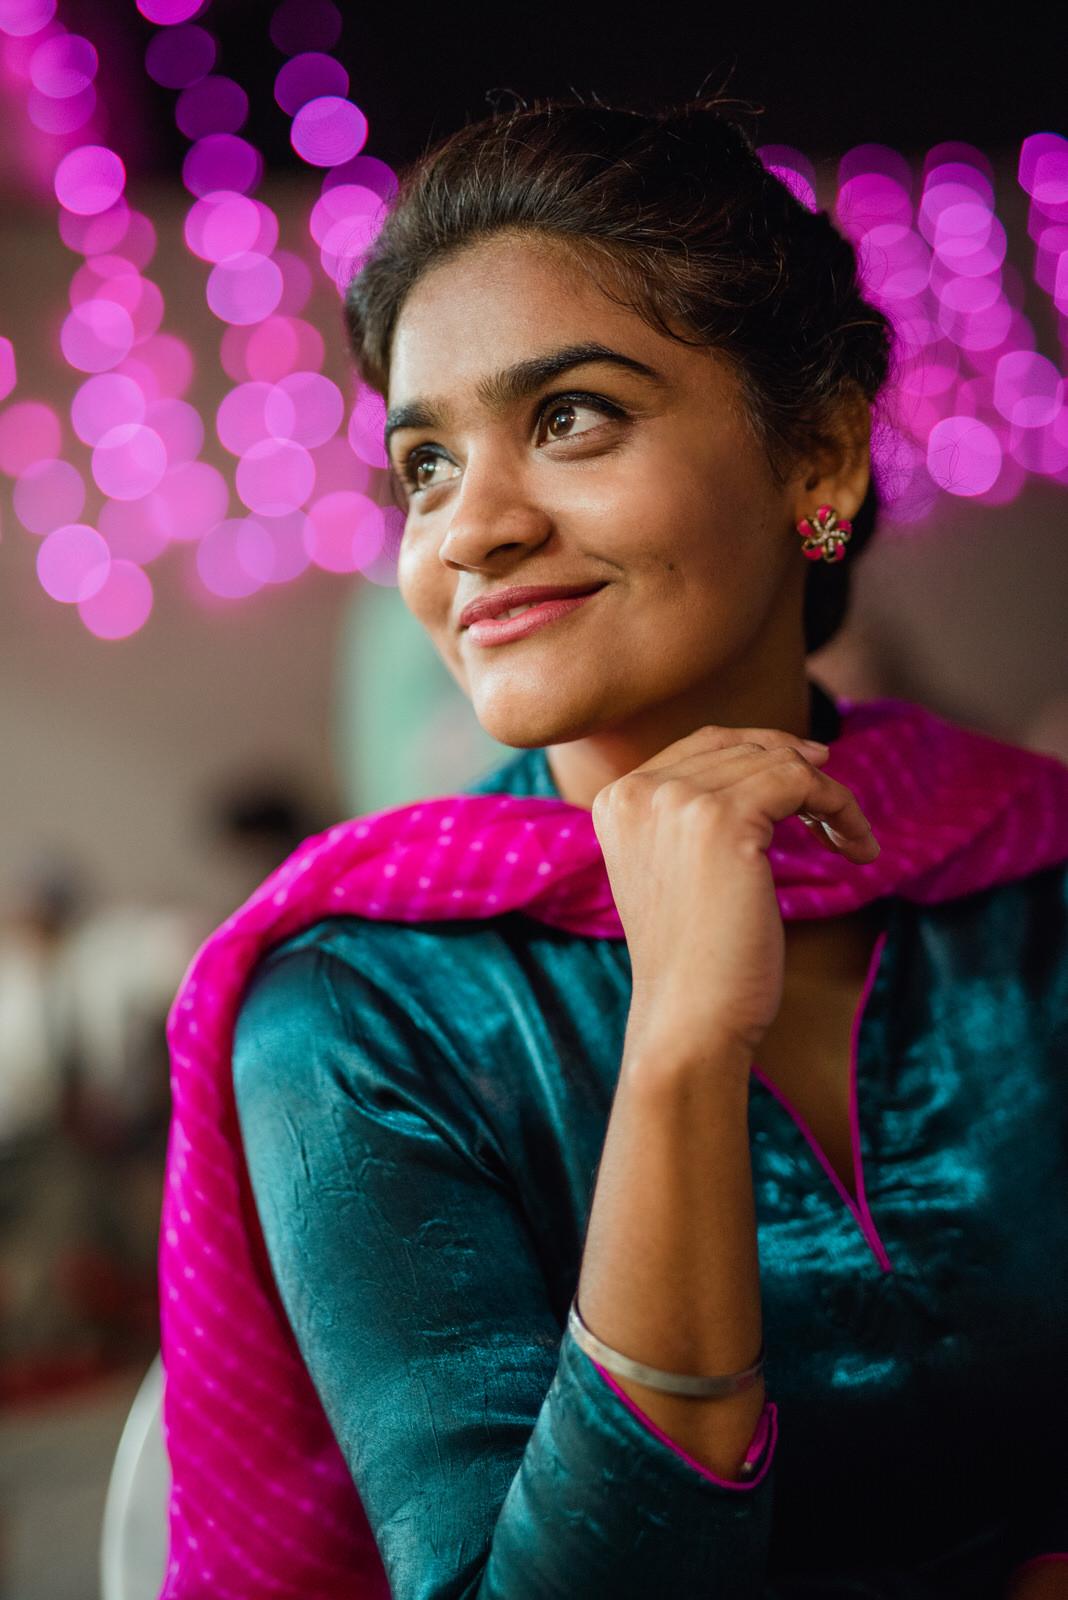 Asian Female Portrait Punjab 2.jpg